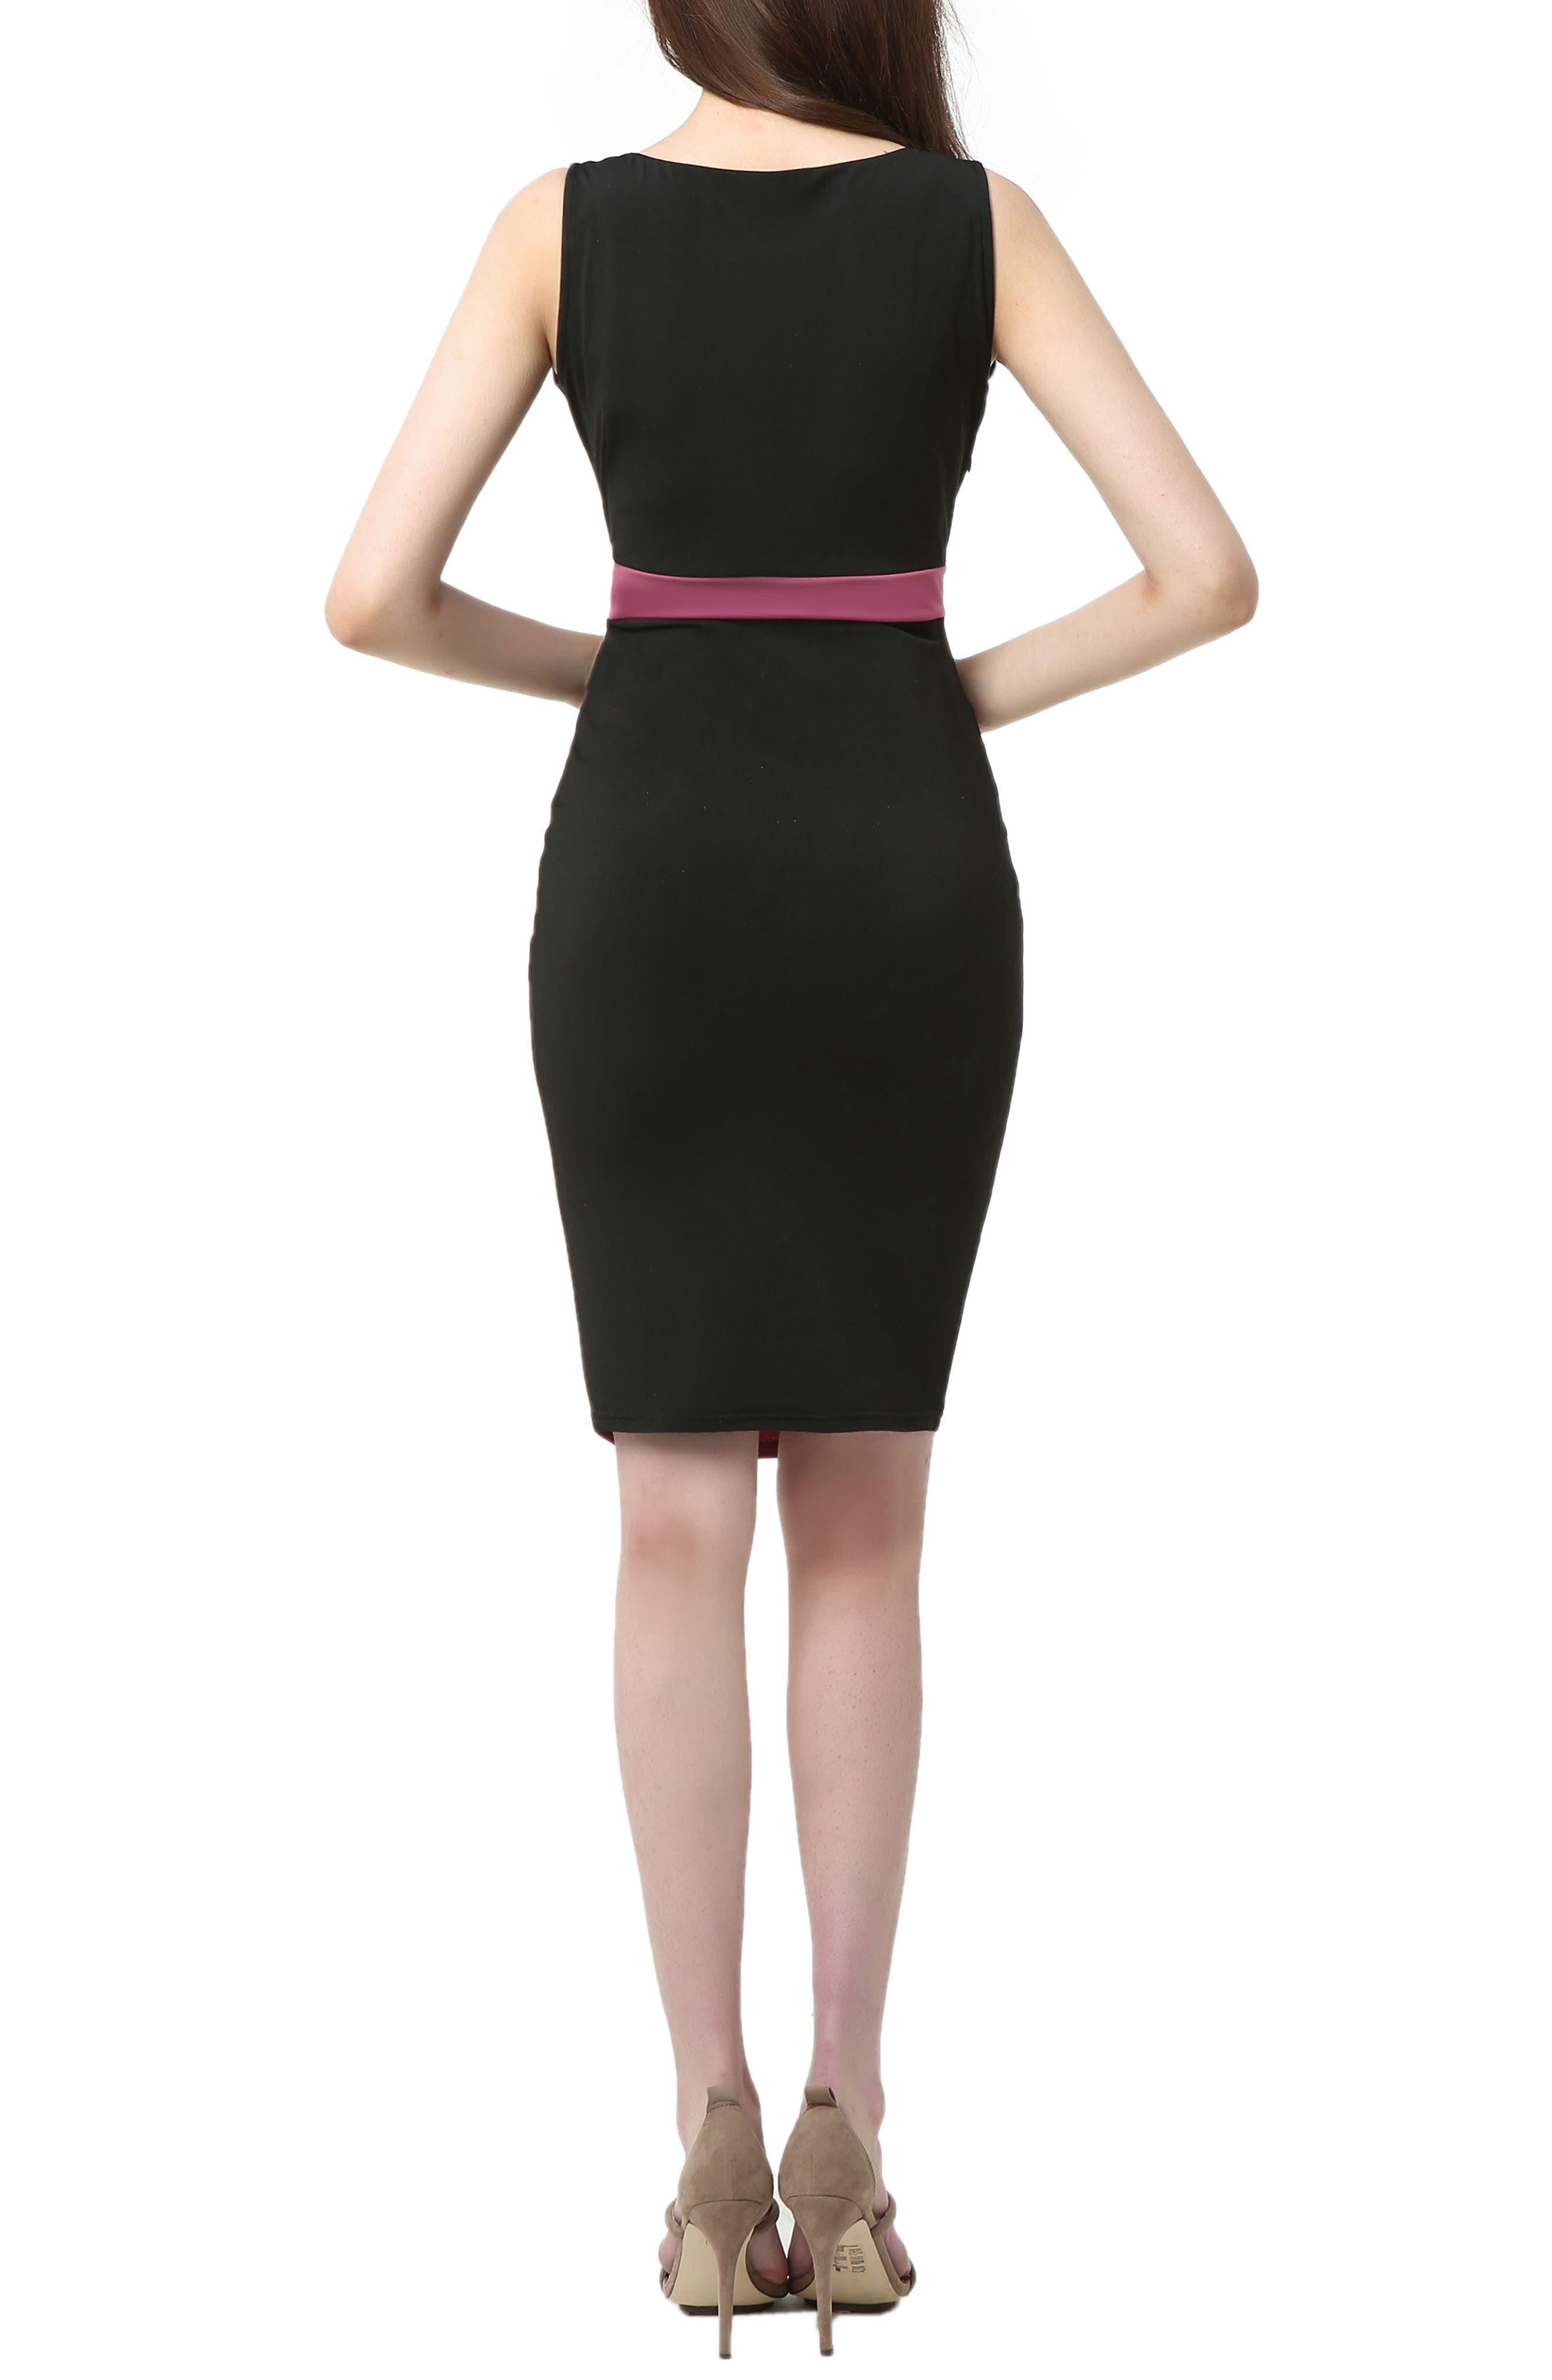 Sophia Colorblock Body-Con Maternity Dress,                             Alternate thumbnail 2, color,                             Black/ Rose